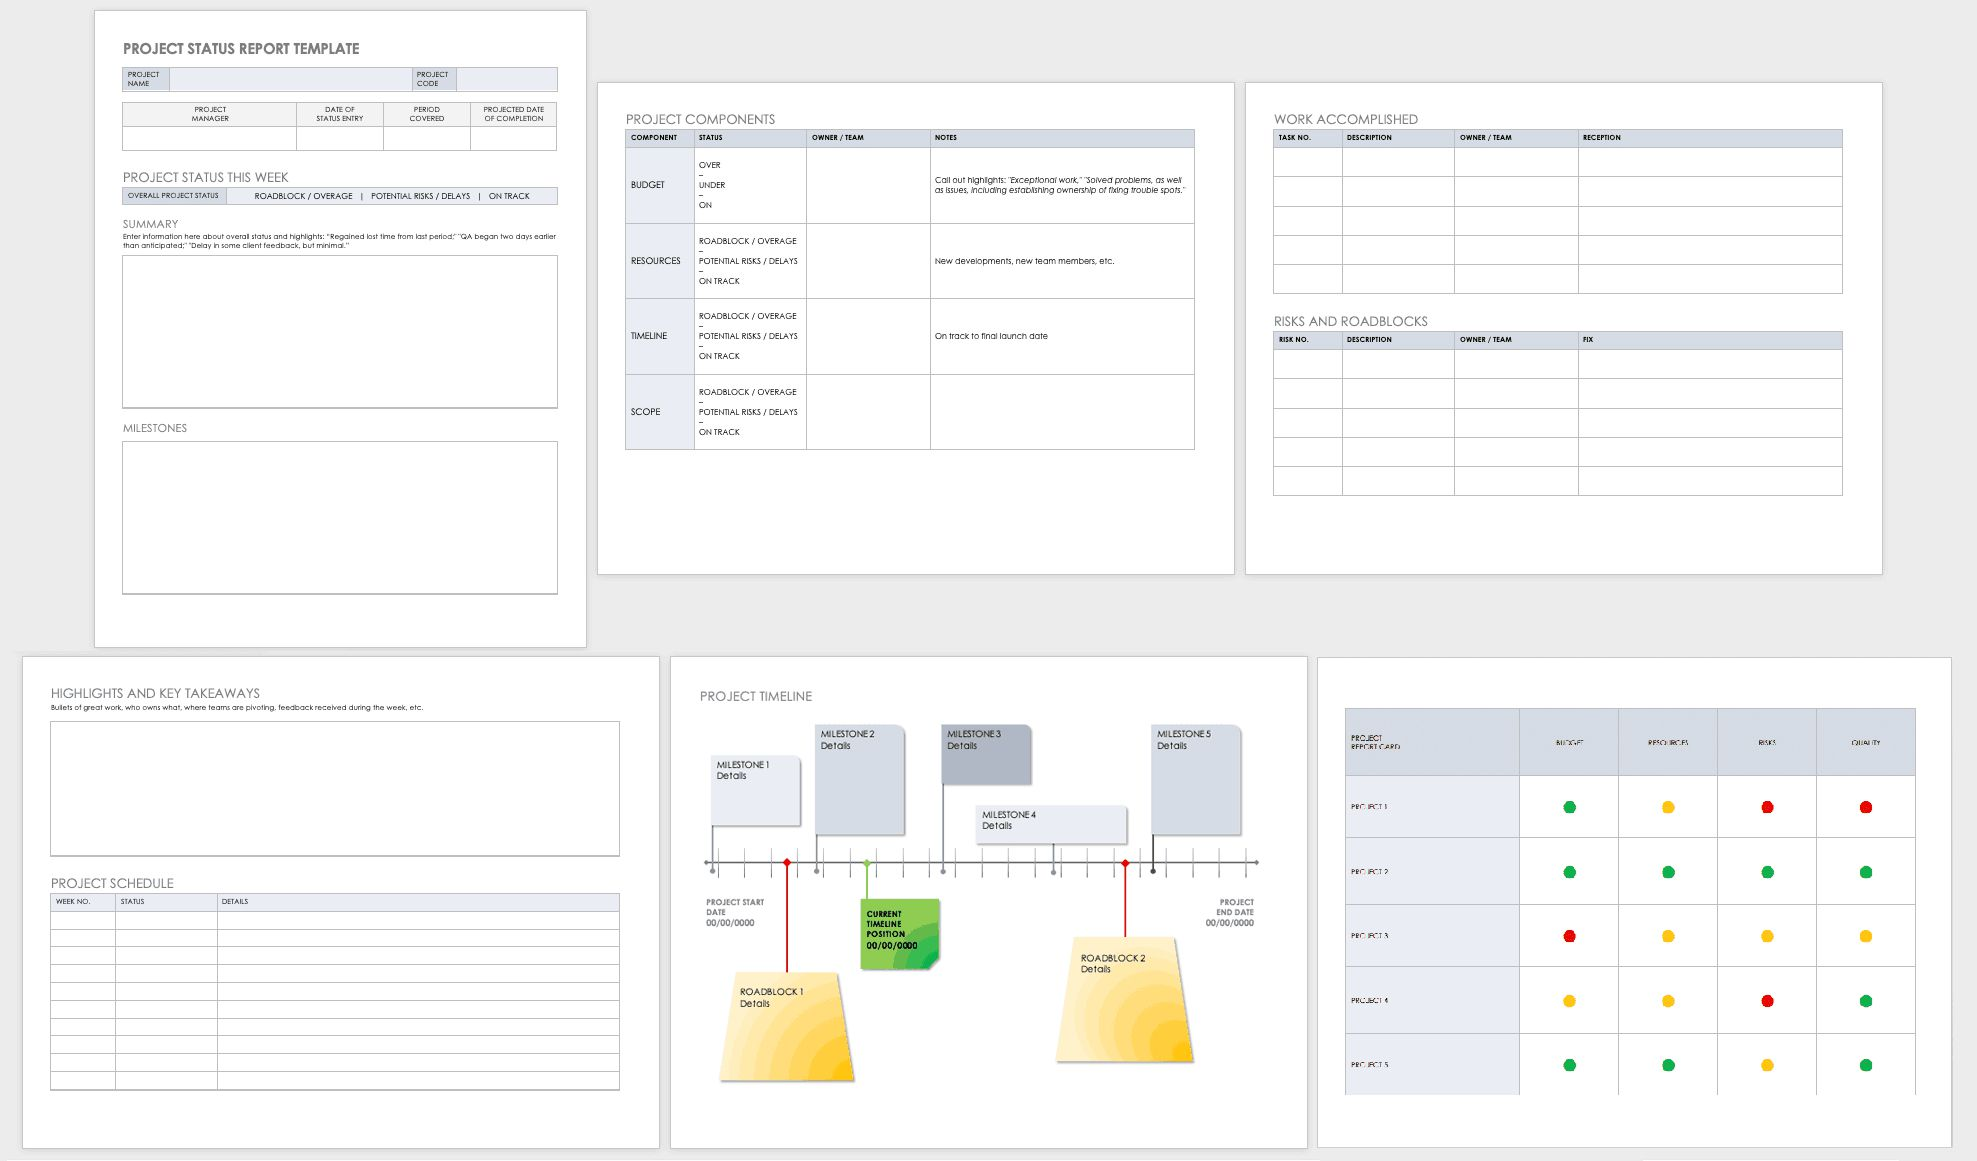 007 Astounding Project Management Statu Report Template Ppt High Resolution  Template+powerpoint WeeklyFull